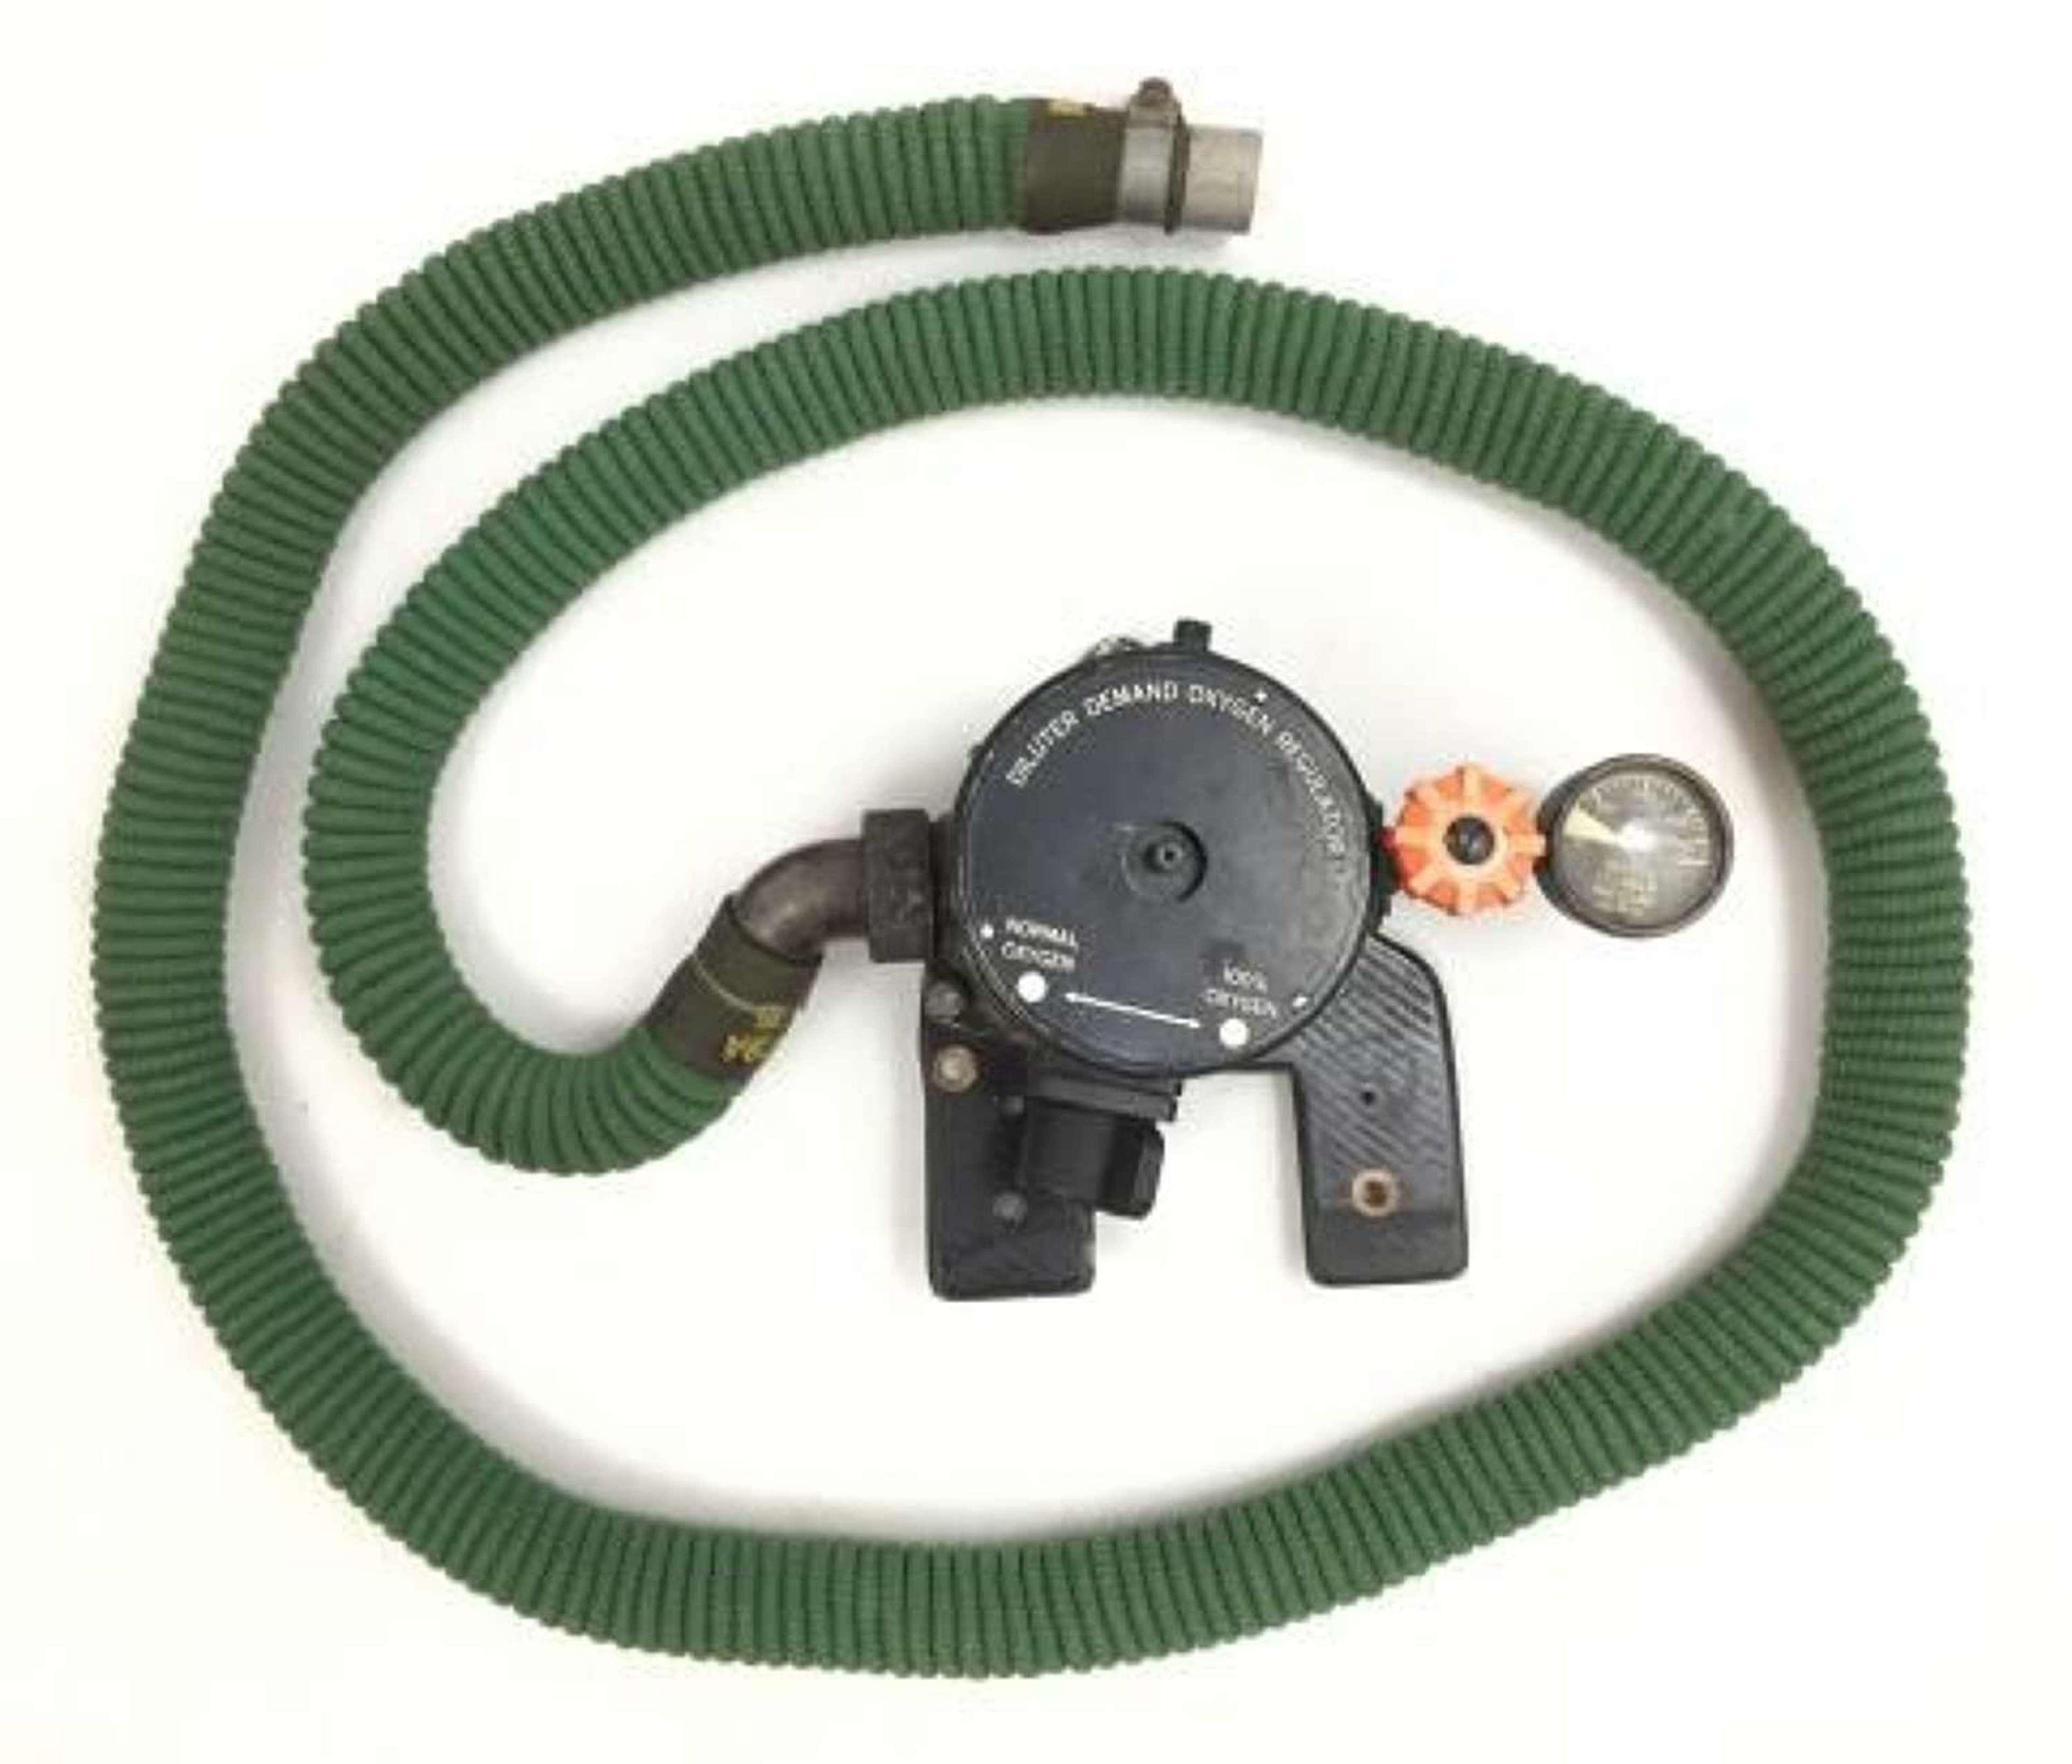 Original Diluter Demand Oxygen Regulator and Hose